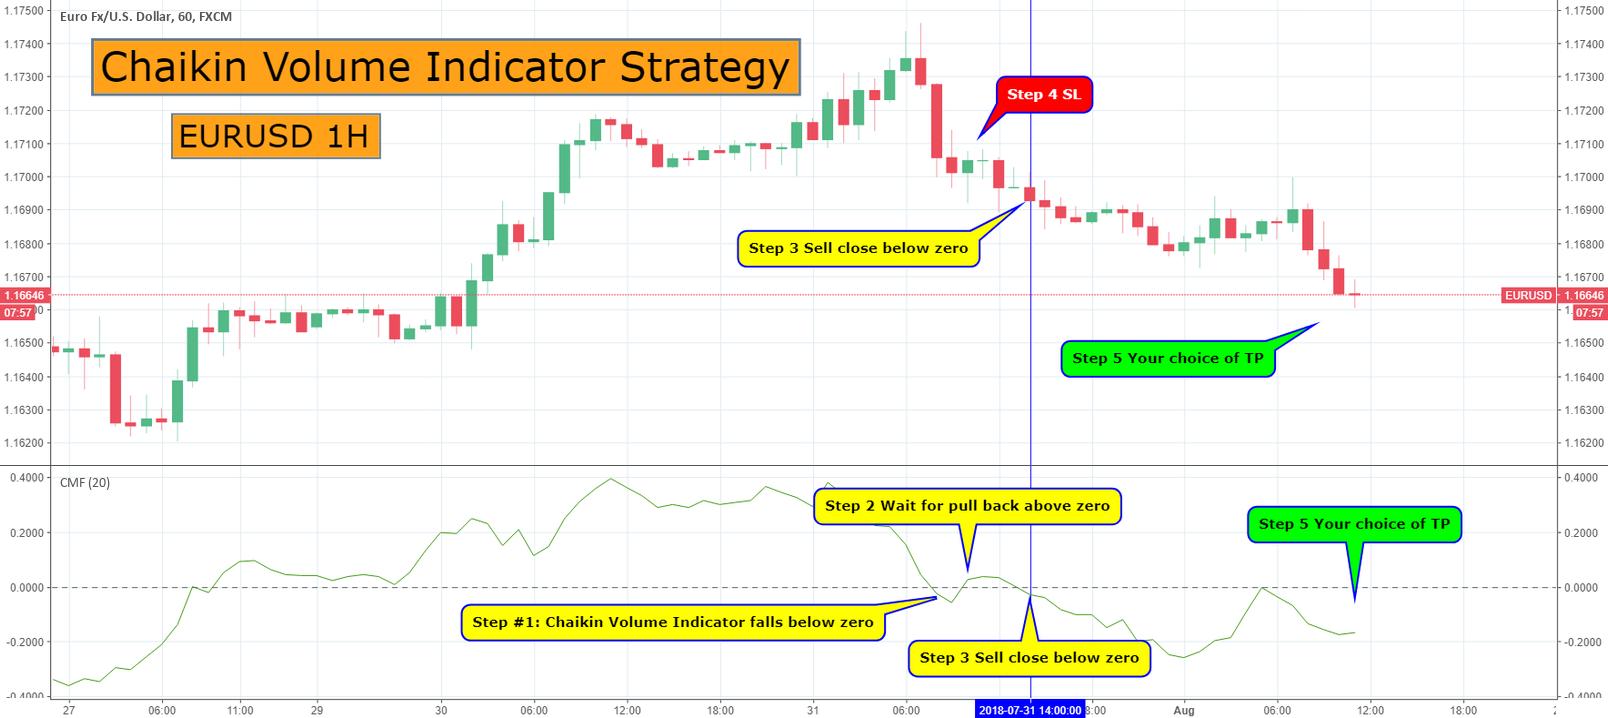 Chaikin Volume Indicator Strategy EURUSD 1H for FX:EURUSD ...